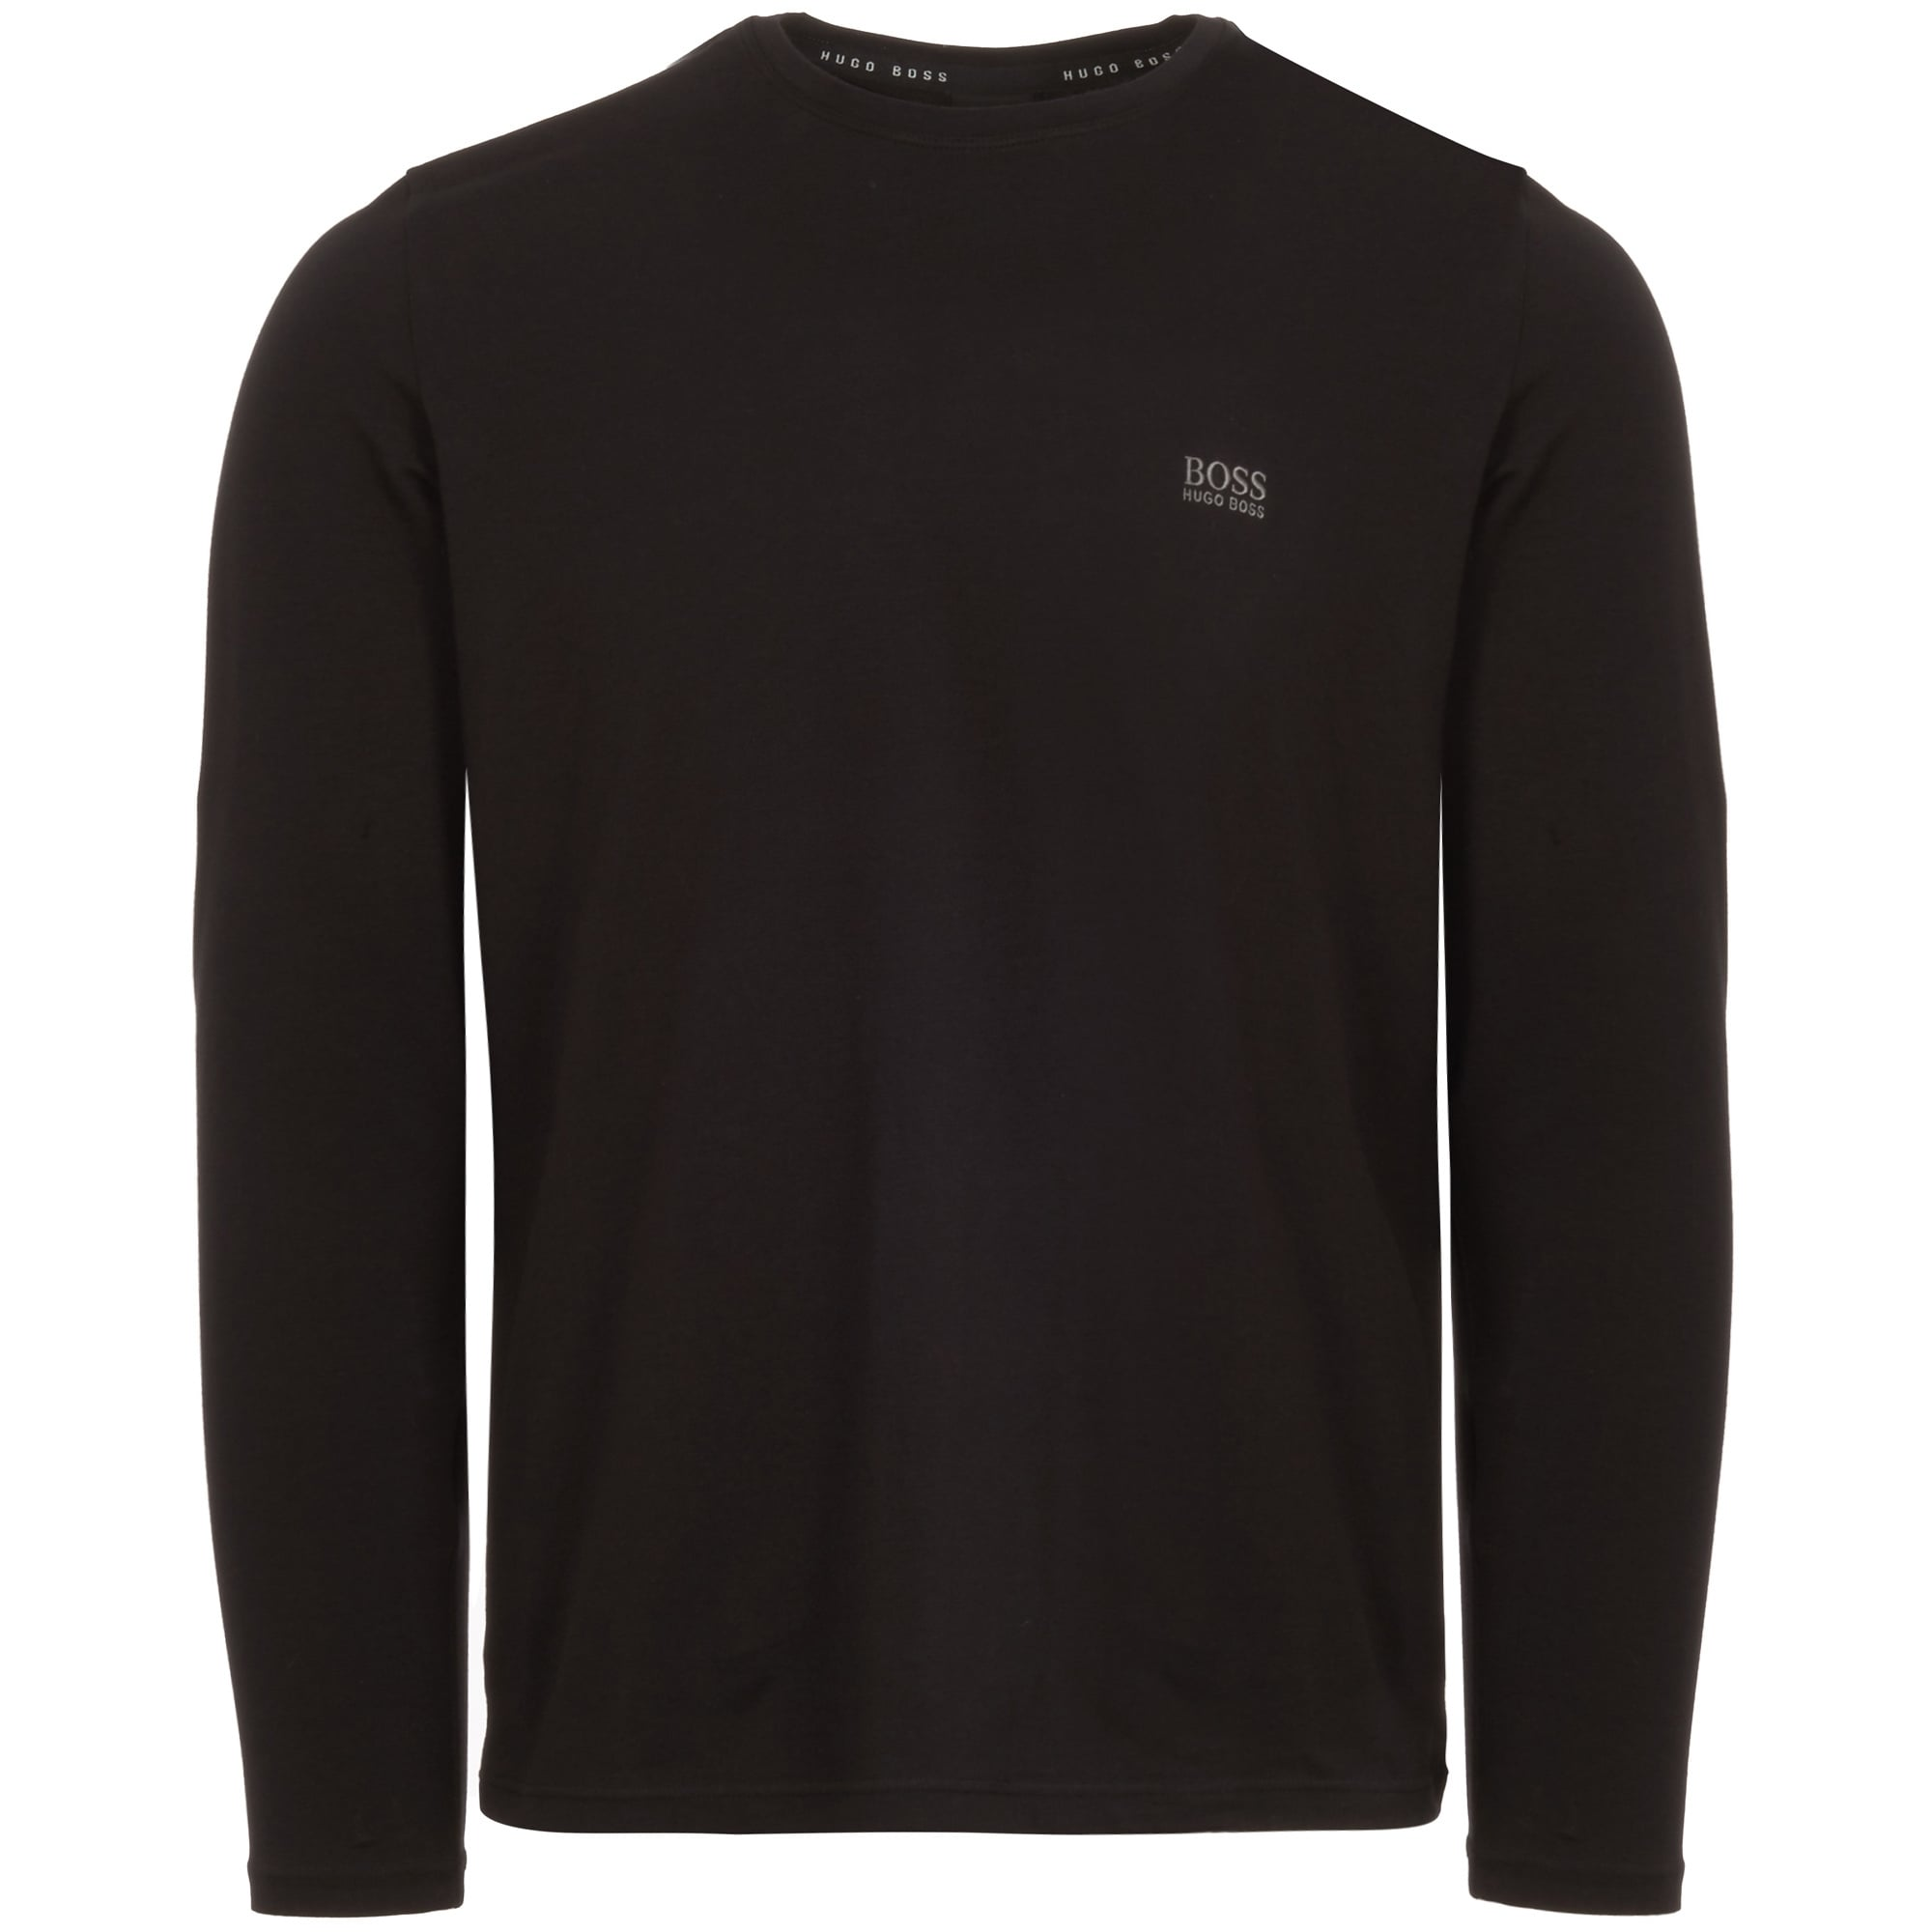 05f2586bfdf Black Long Sleeve Stretch Cotton T-Shirt